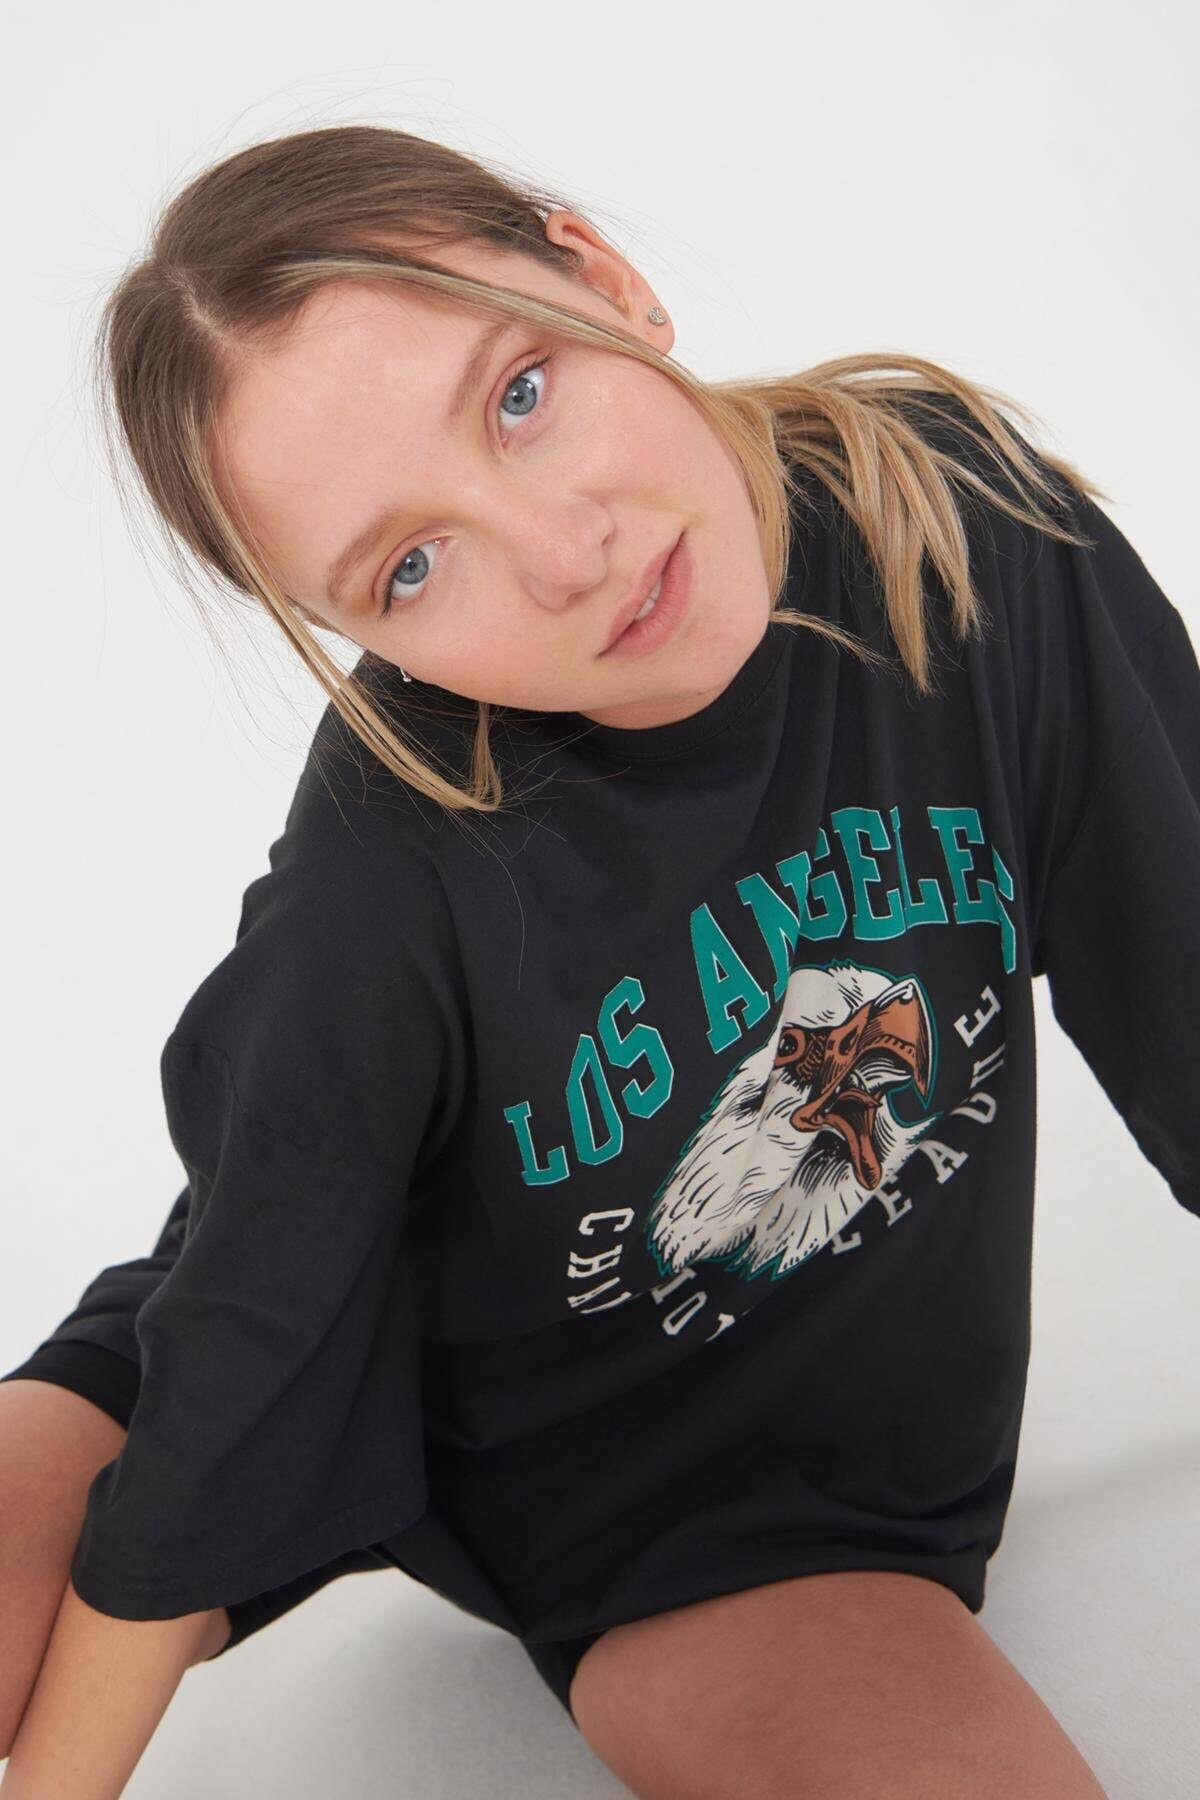 Addax Kadın Füme Baskılı T-Shirt P9420 - C5 Adx-0000022126 2